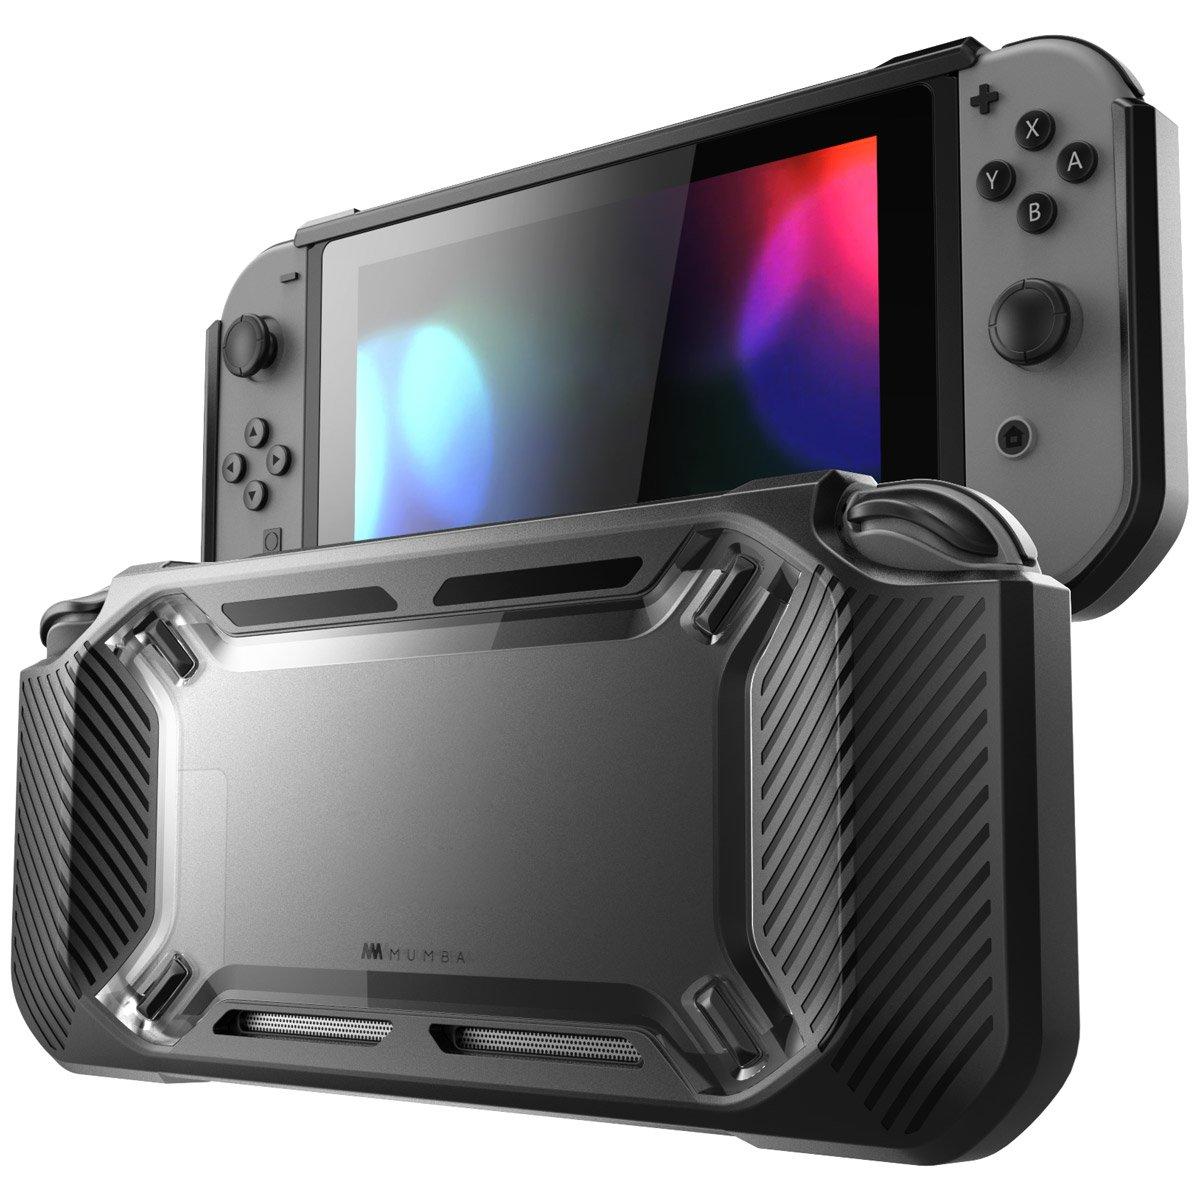 f:id:NintendoDaily:20190813194511j:plain